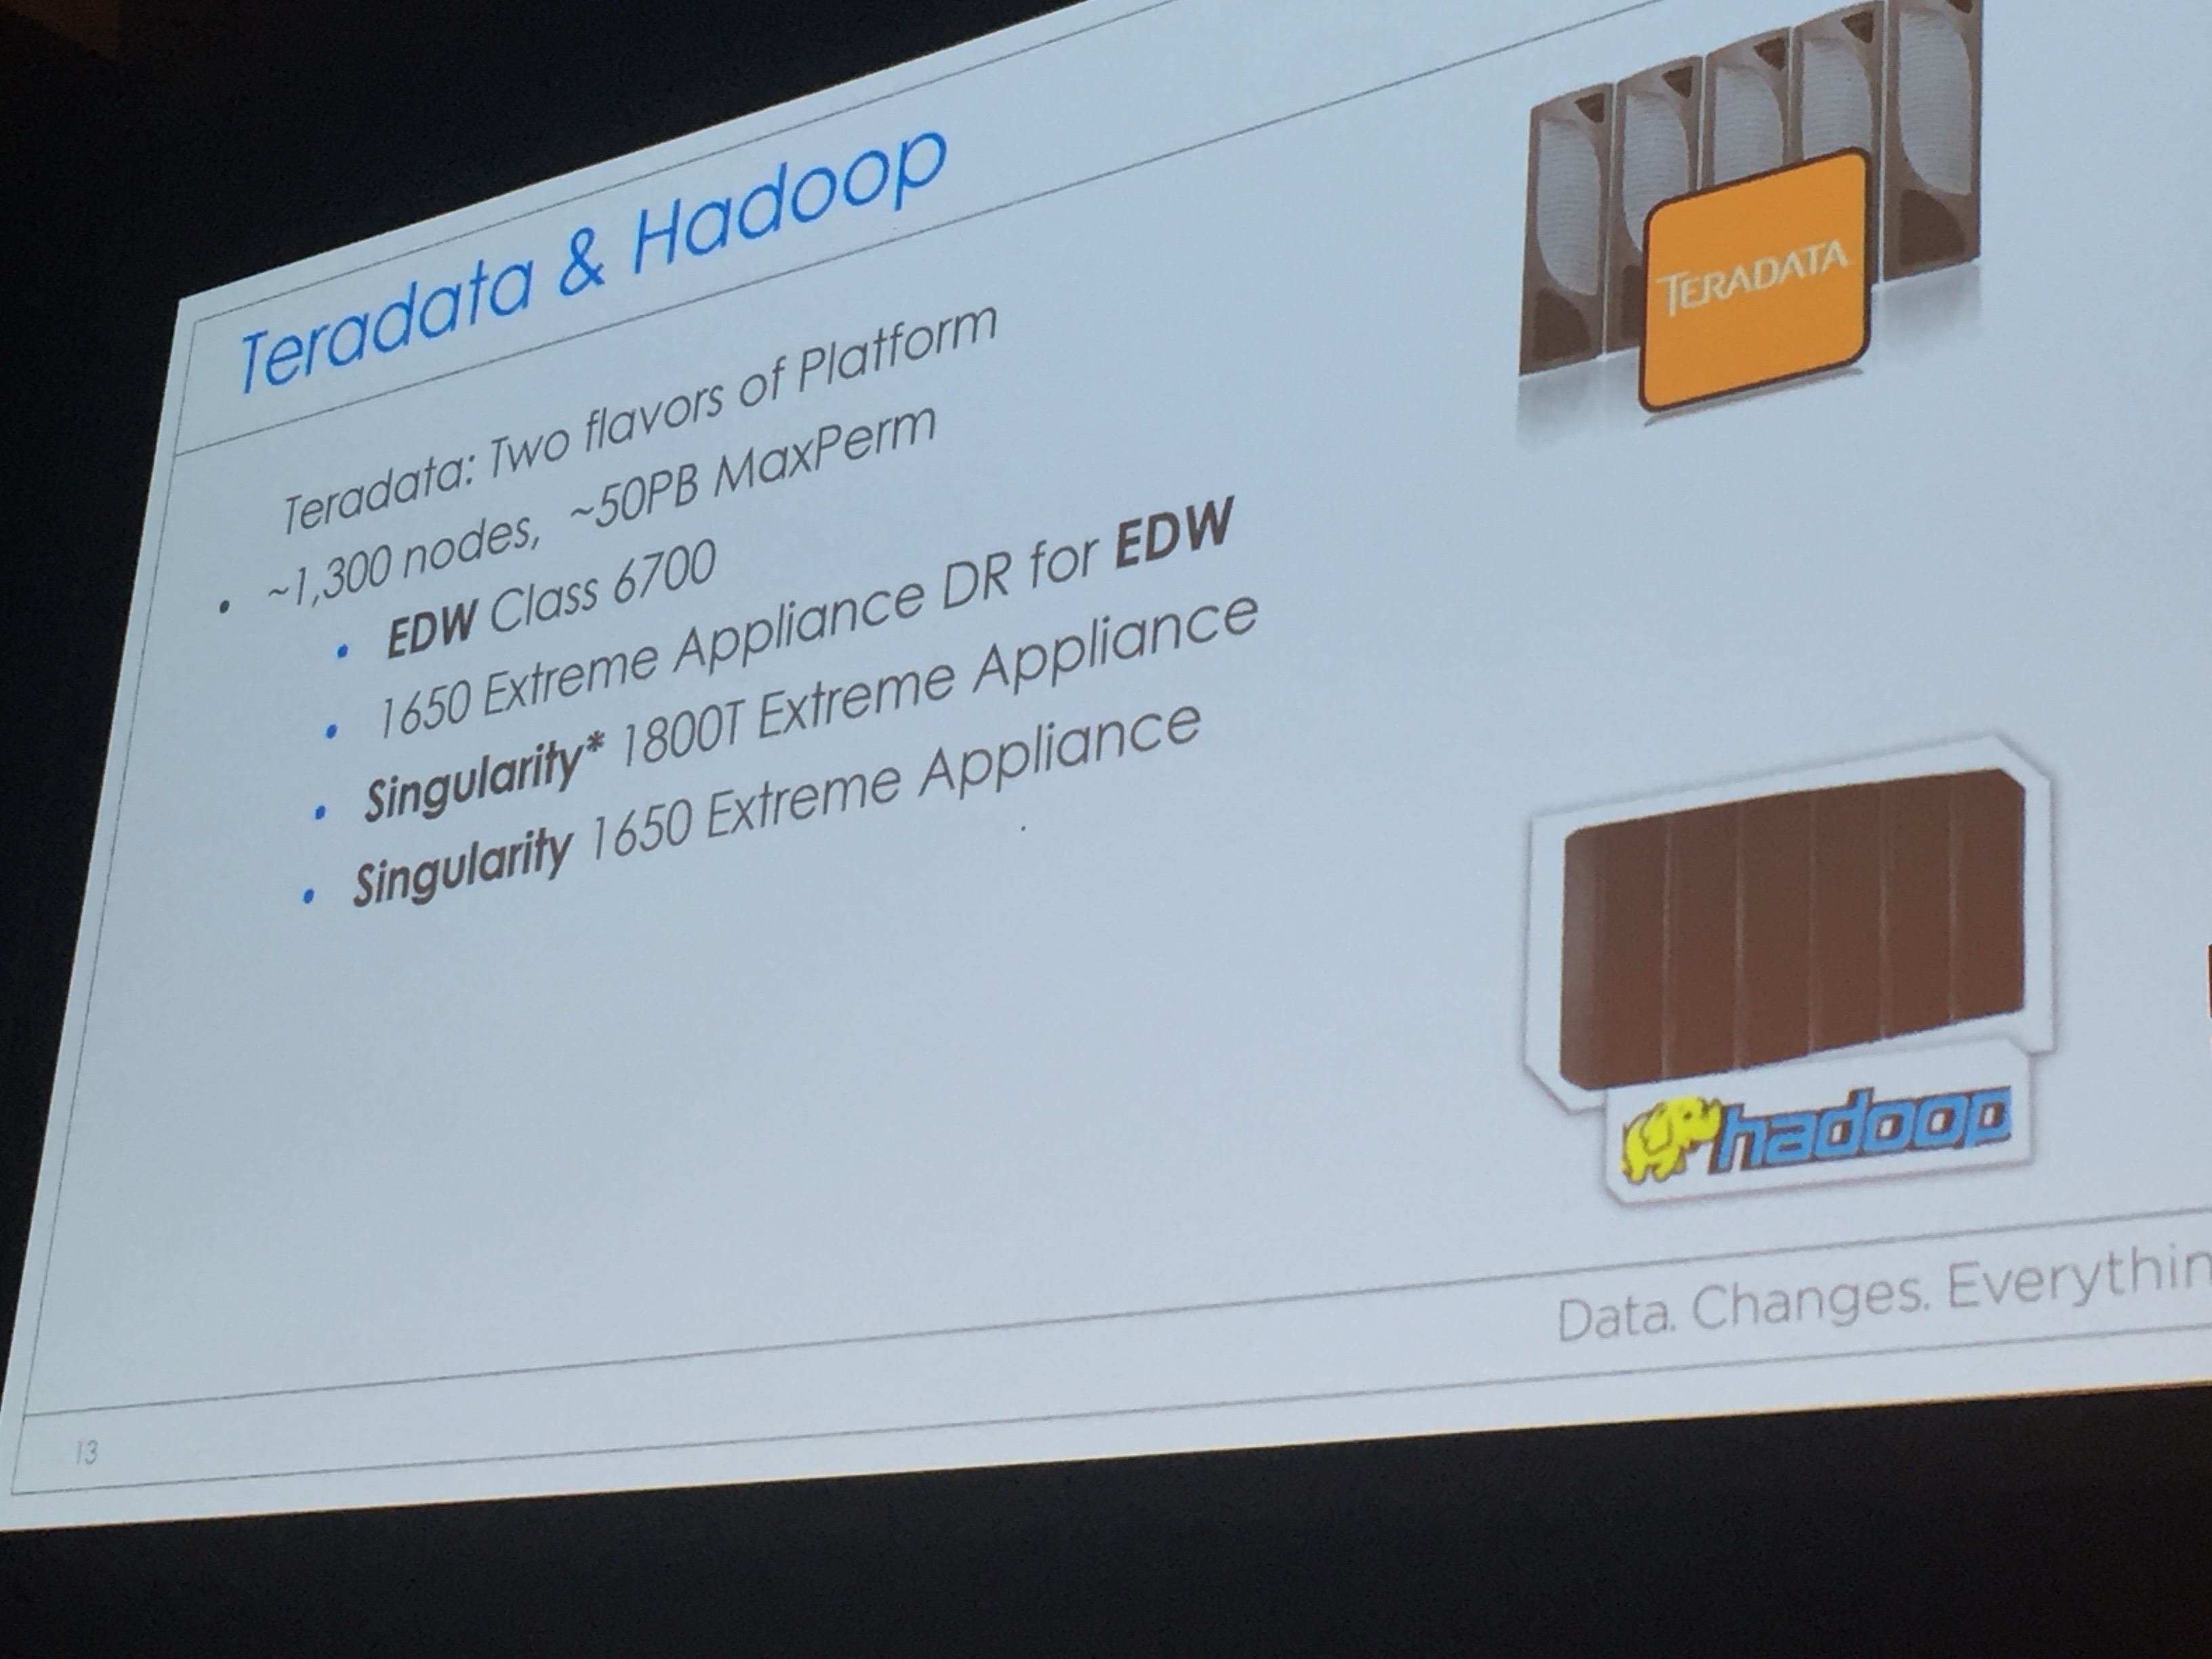 eBay: using Hadoop and Teradata tech for managing large data sets